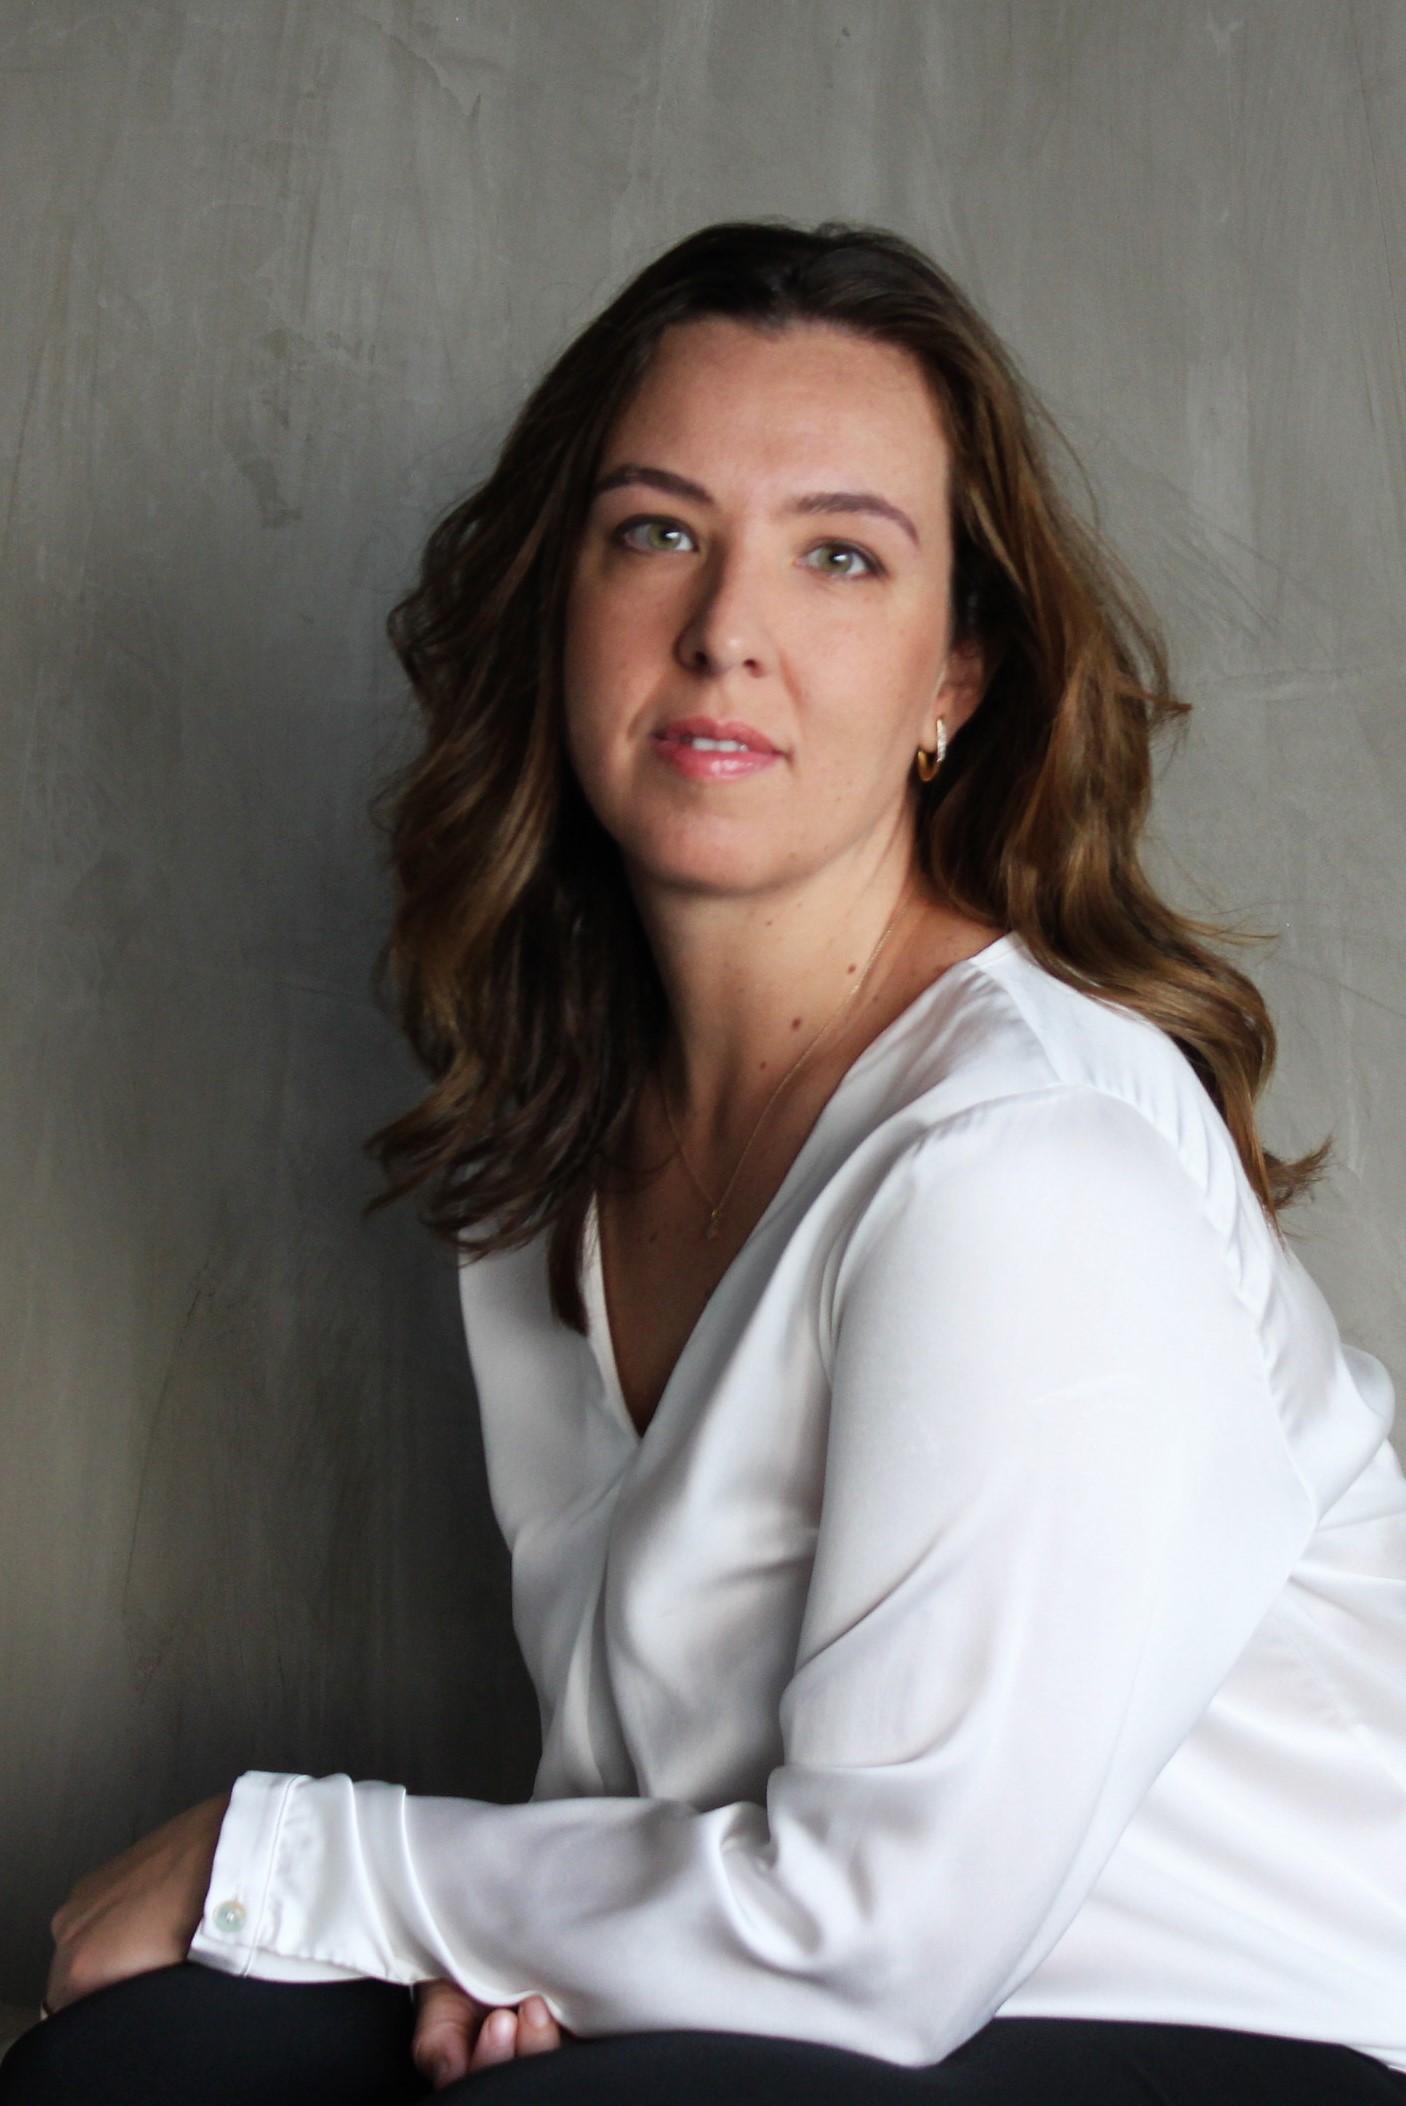 IMG 1023+%282%29 - Interview: Marilia Carvalhinha, Consultora estratégica e coordenadora da pós de moda e varejo na Faap.